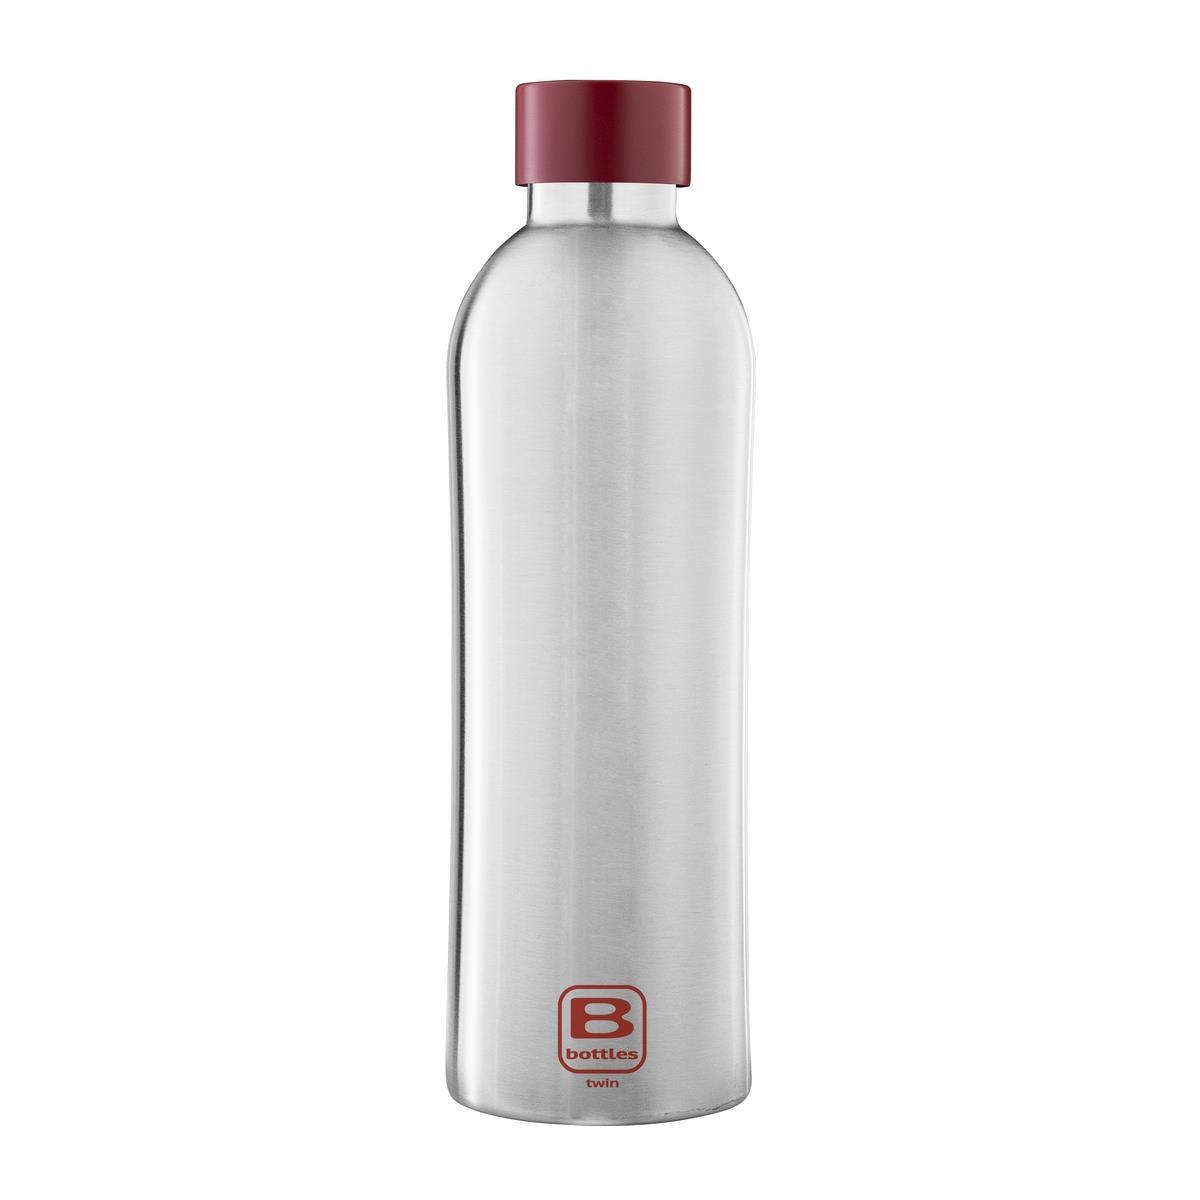 B Bottles Twin - Steel & Red - 800 ml - Bottiglia Termica a doppia parete in acciaio inox 18/10